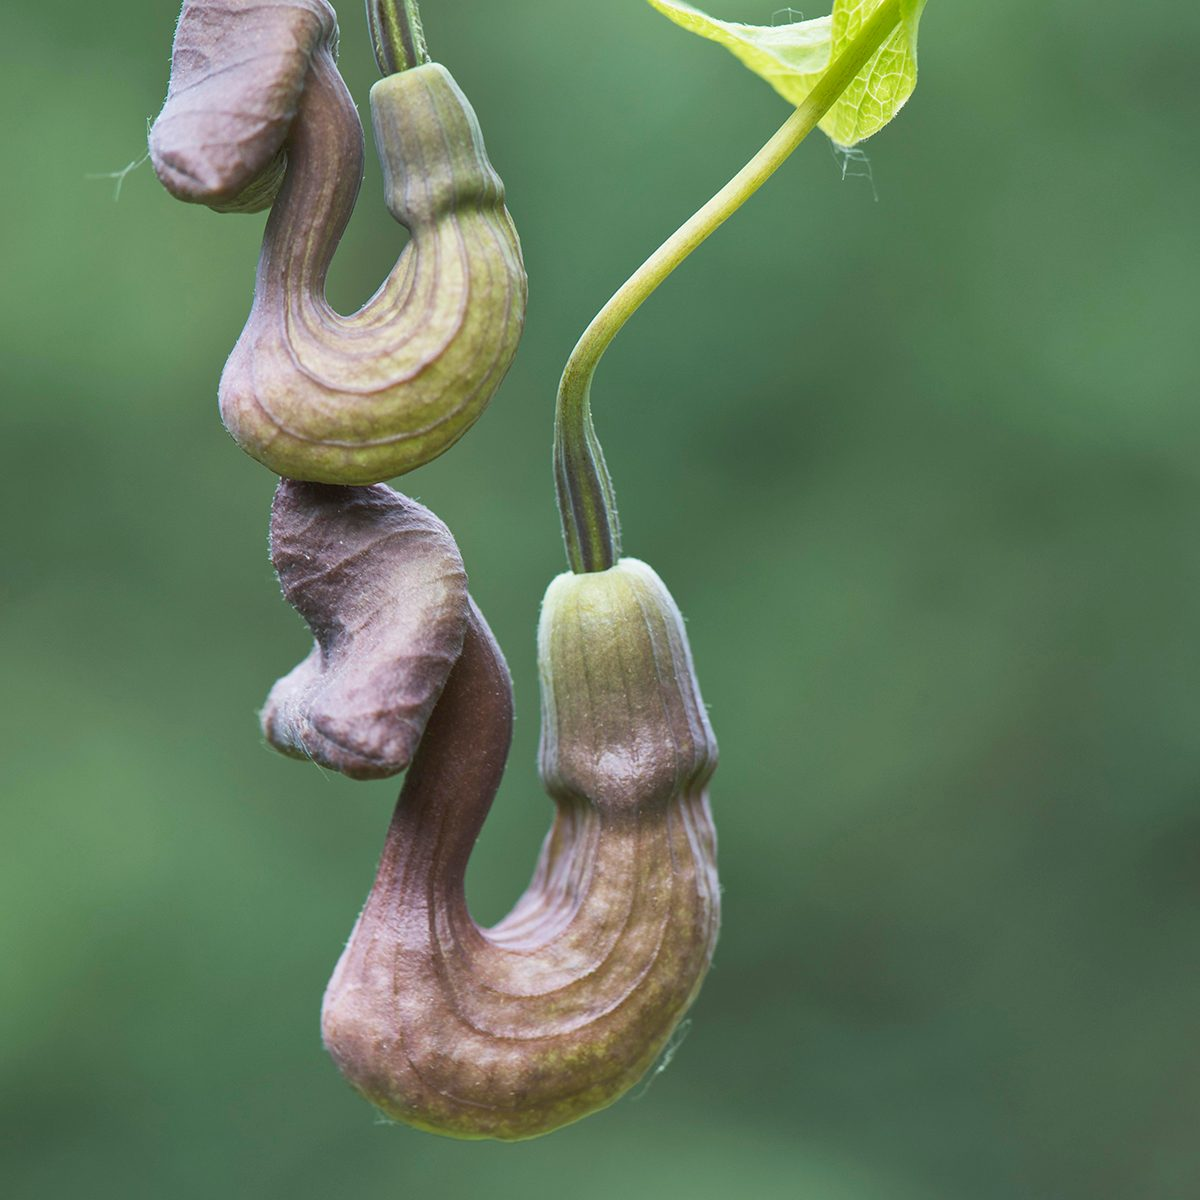 Dutchman's pipe (Aristolochia macrophylla), flowers, Emsland, Lower Saxony, Germany